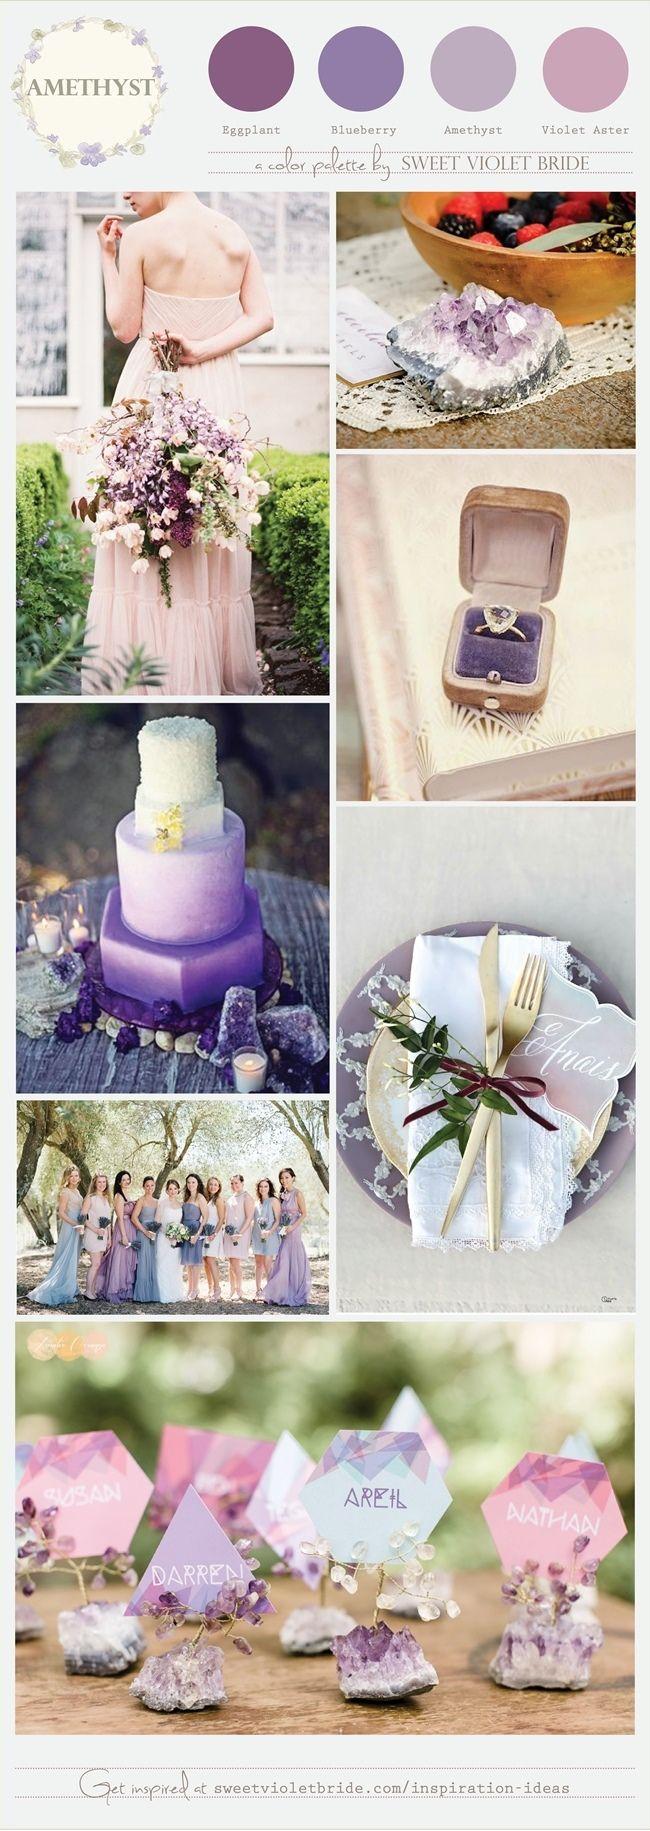 Wedding Color Palette: Amethyst